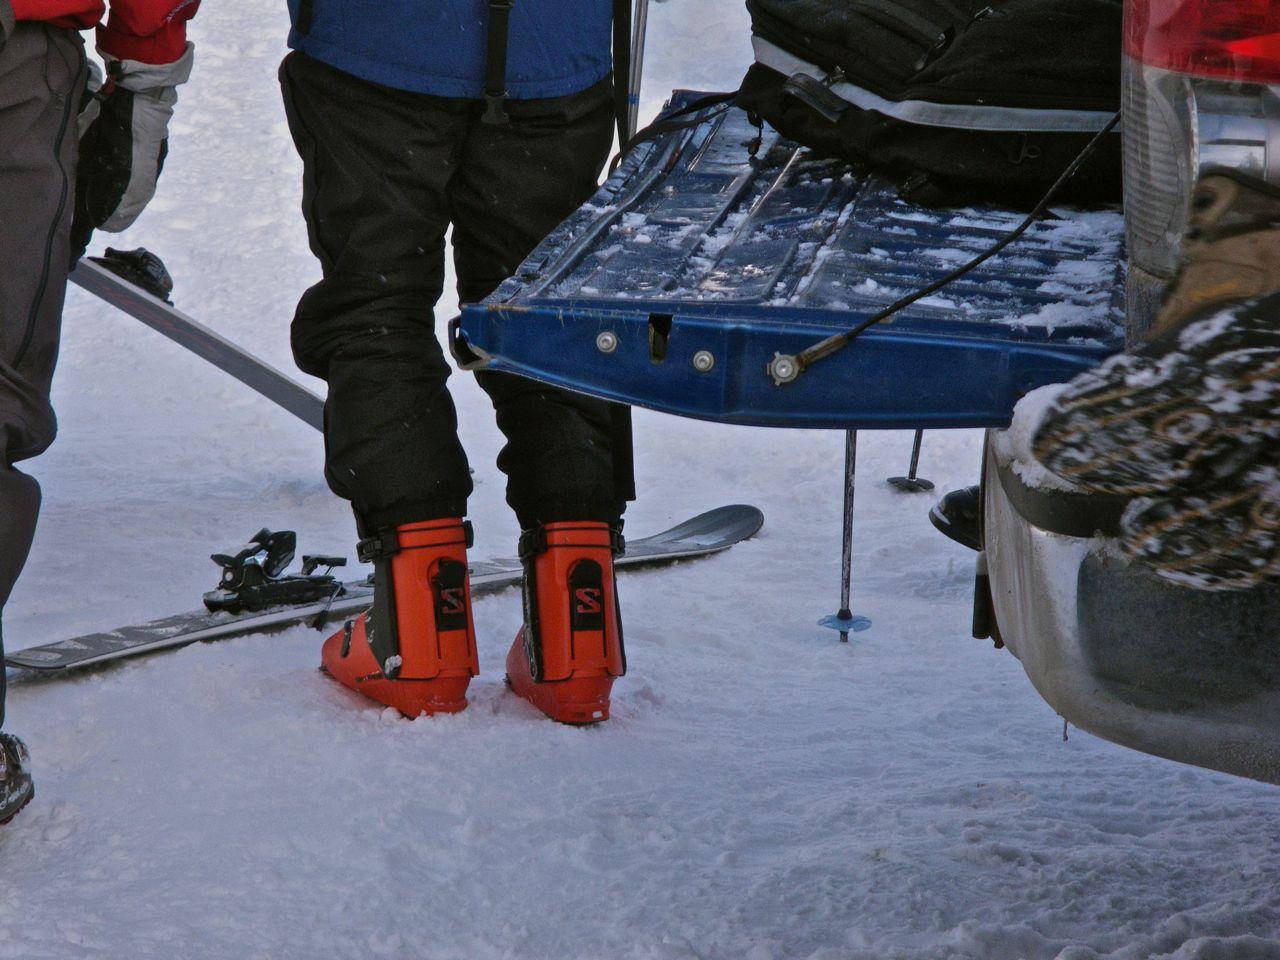 Next year's Salomon boots